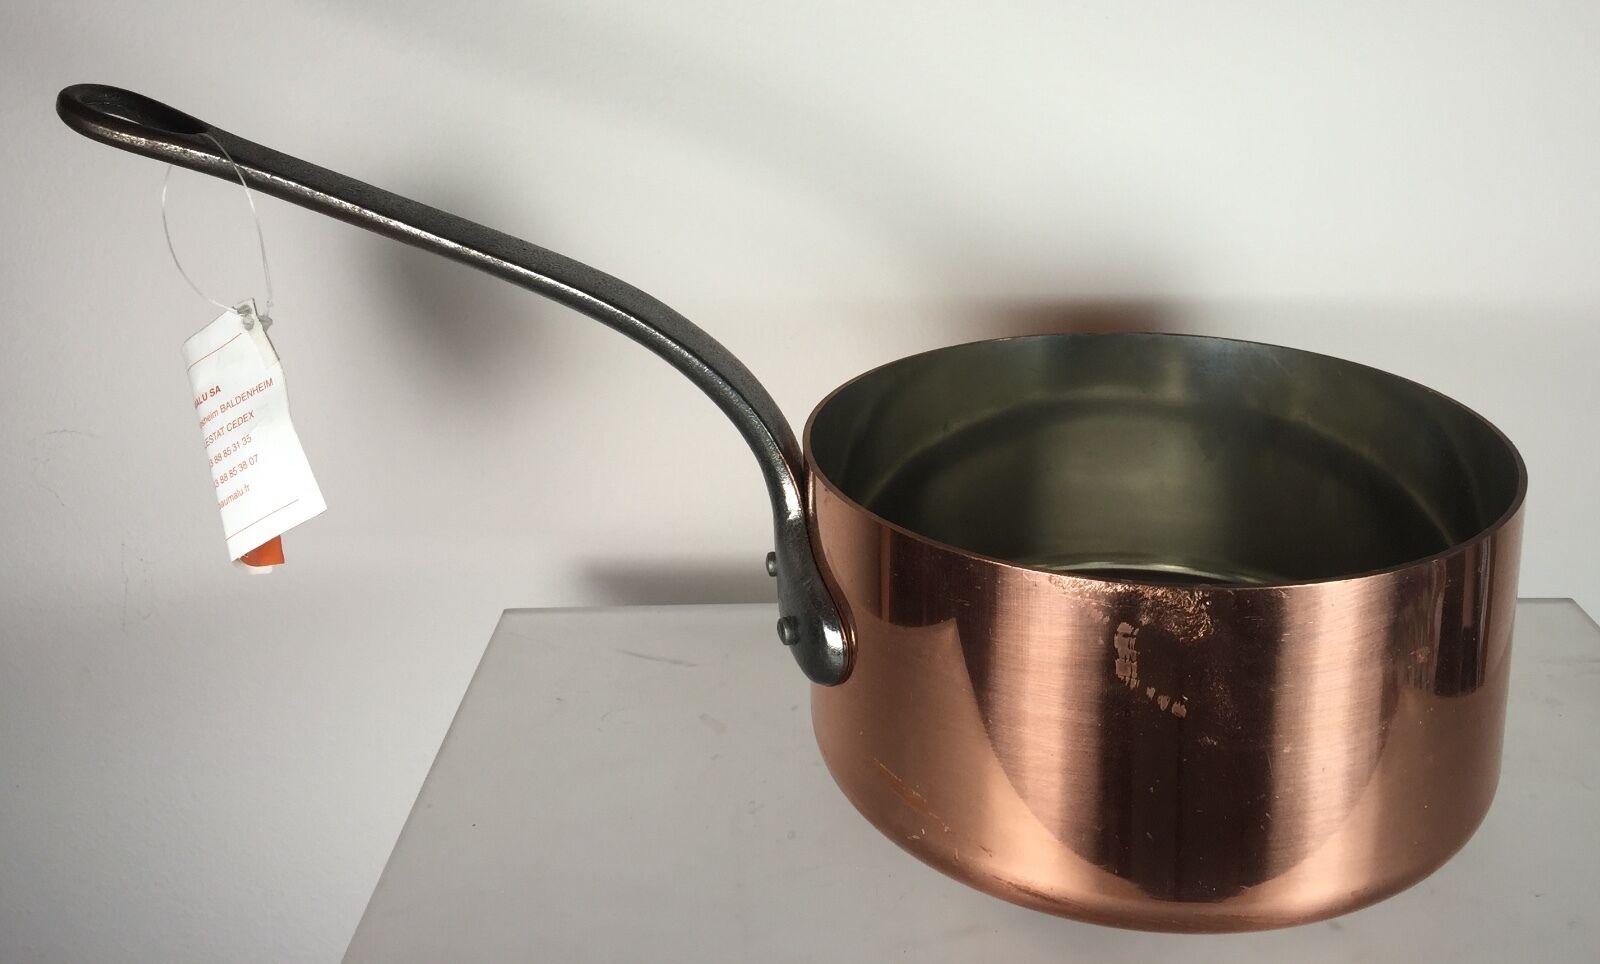 BAUMALU copper sauce pan 7  POT made in France poids 3 Lb (environ 1.36 kg) 7 oz (environ 198.44 g)